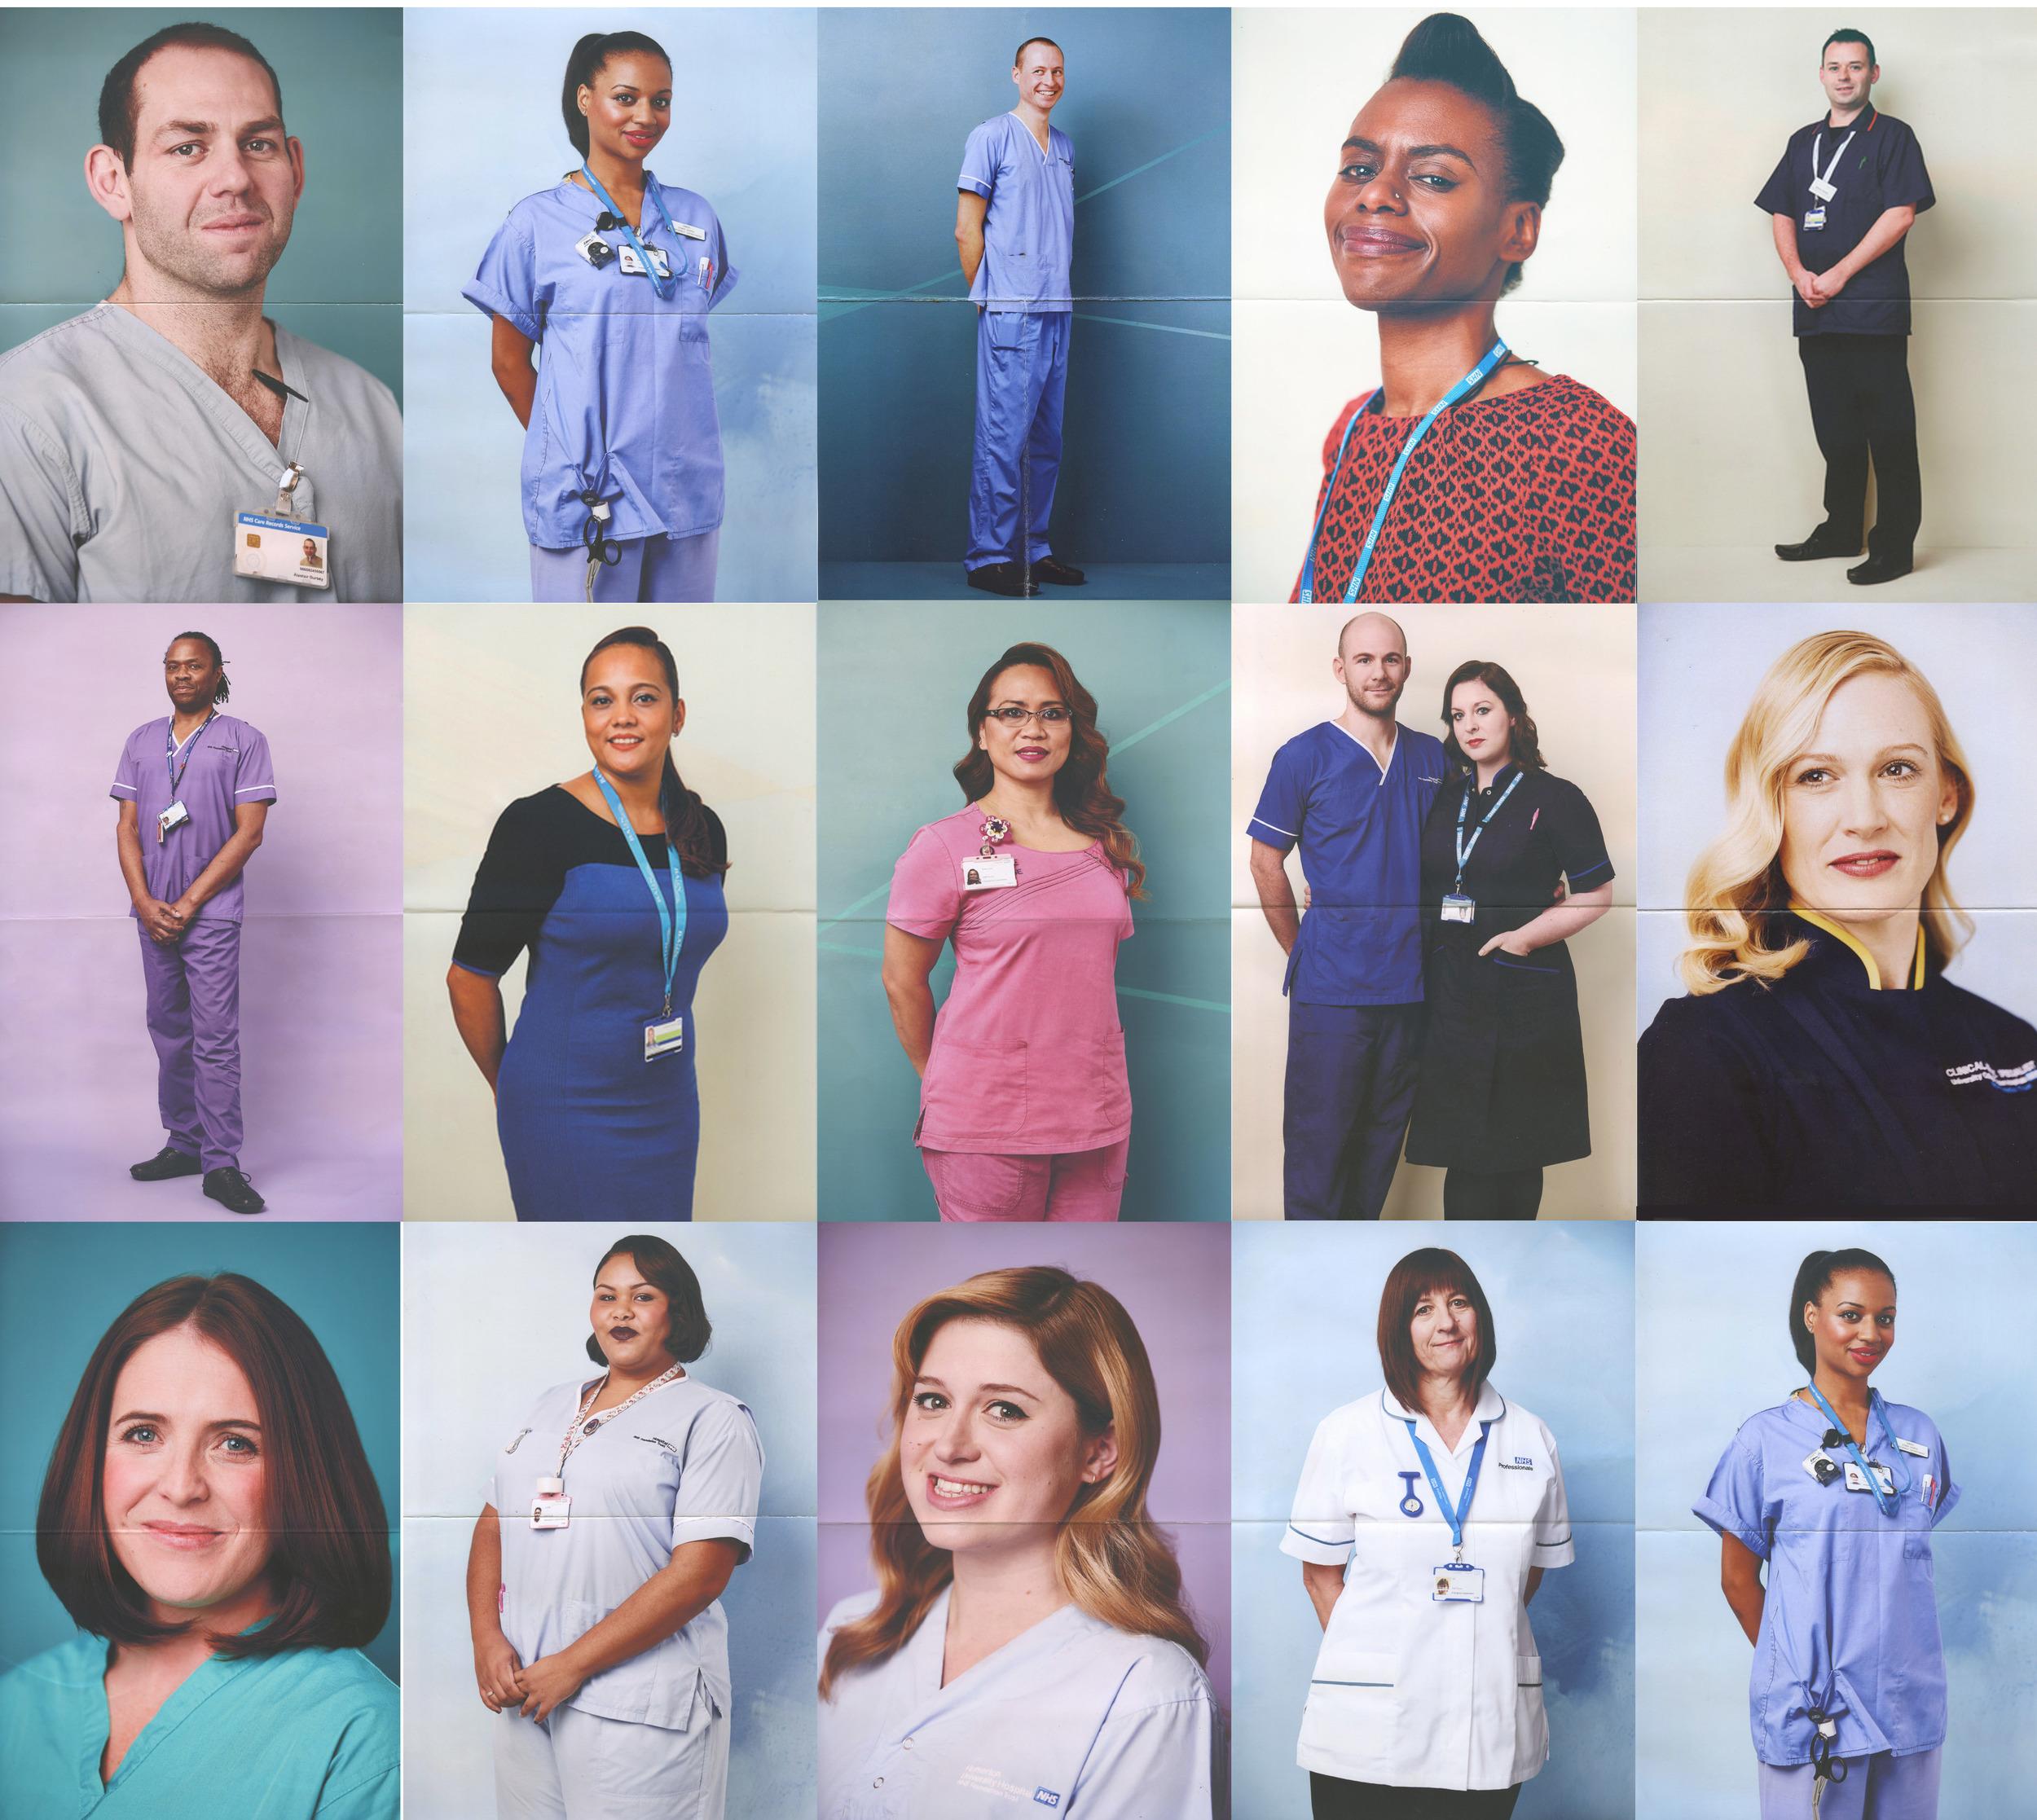 One Nice Thing - portraits of nurses